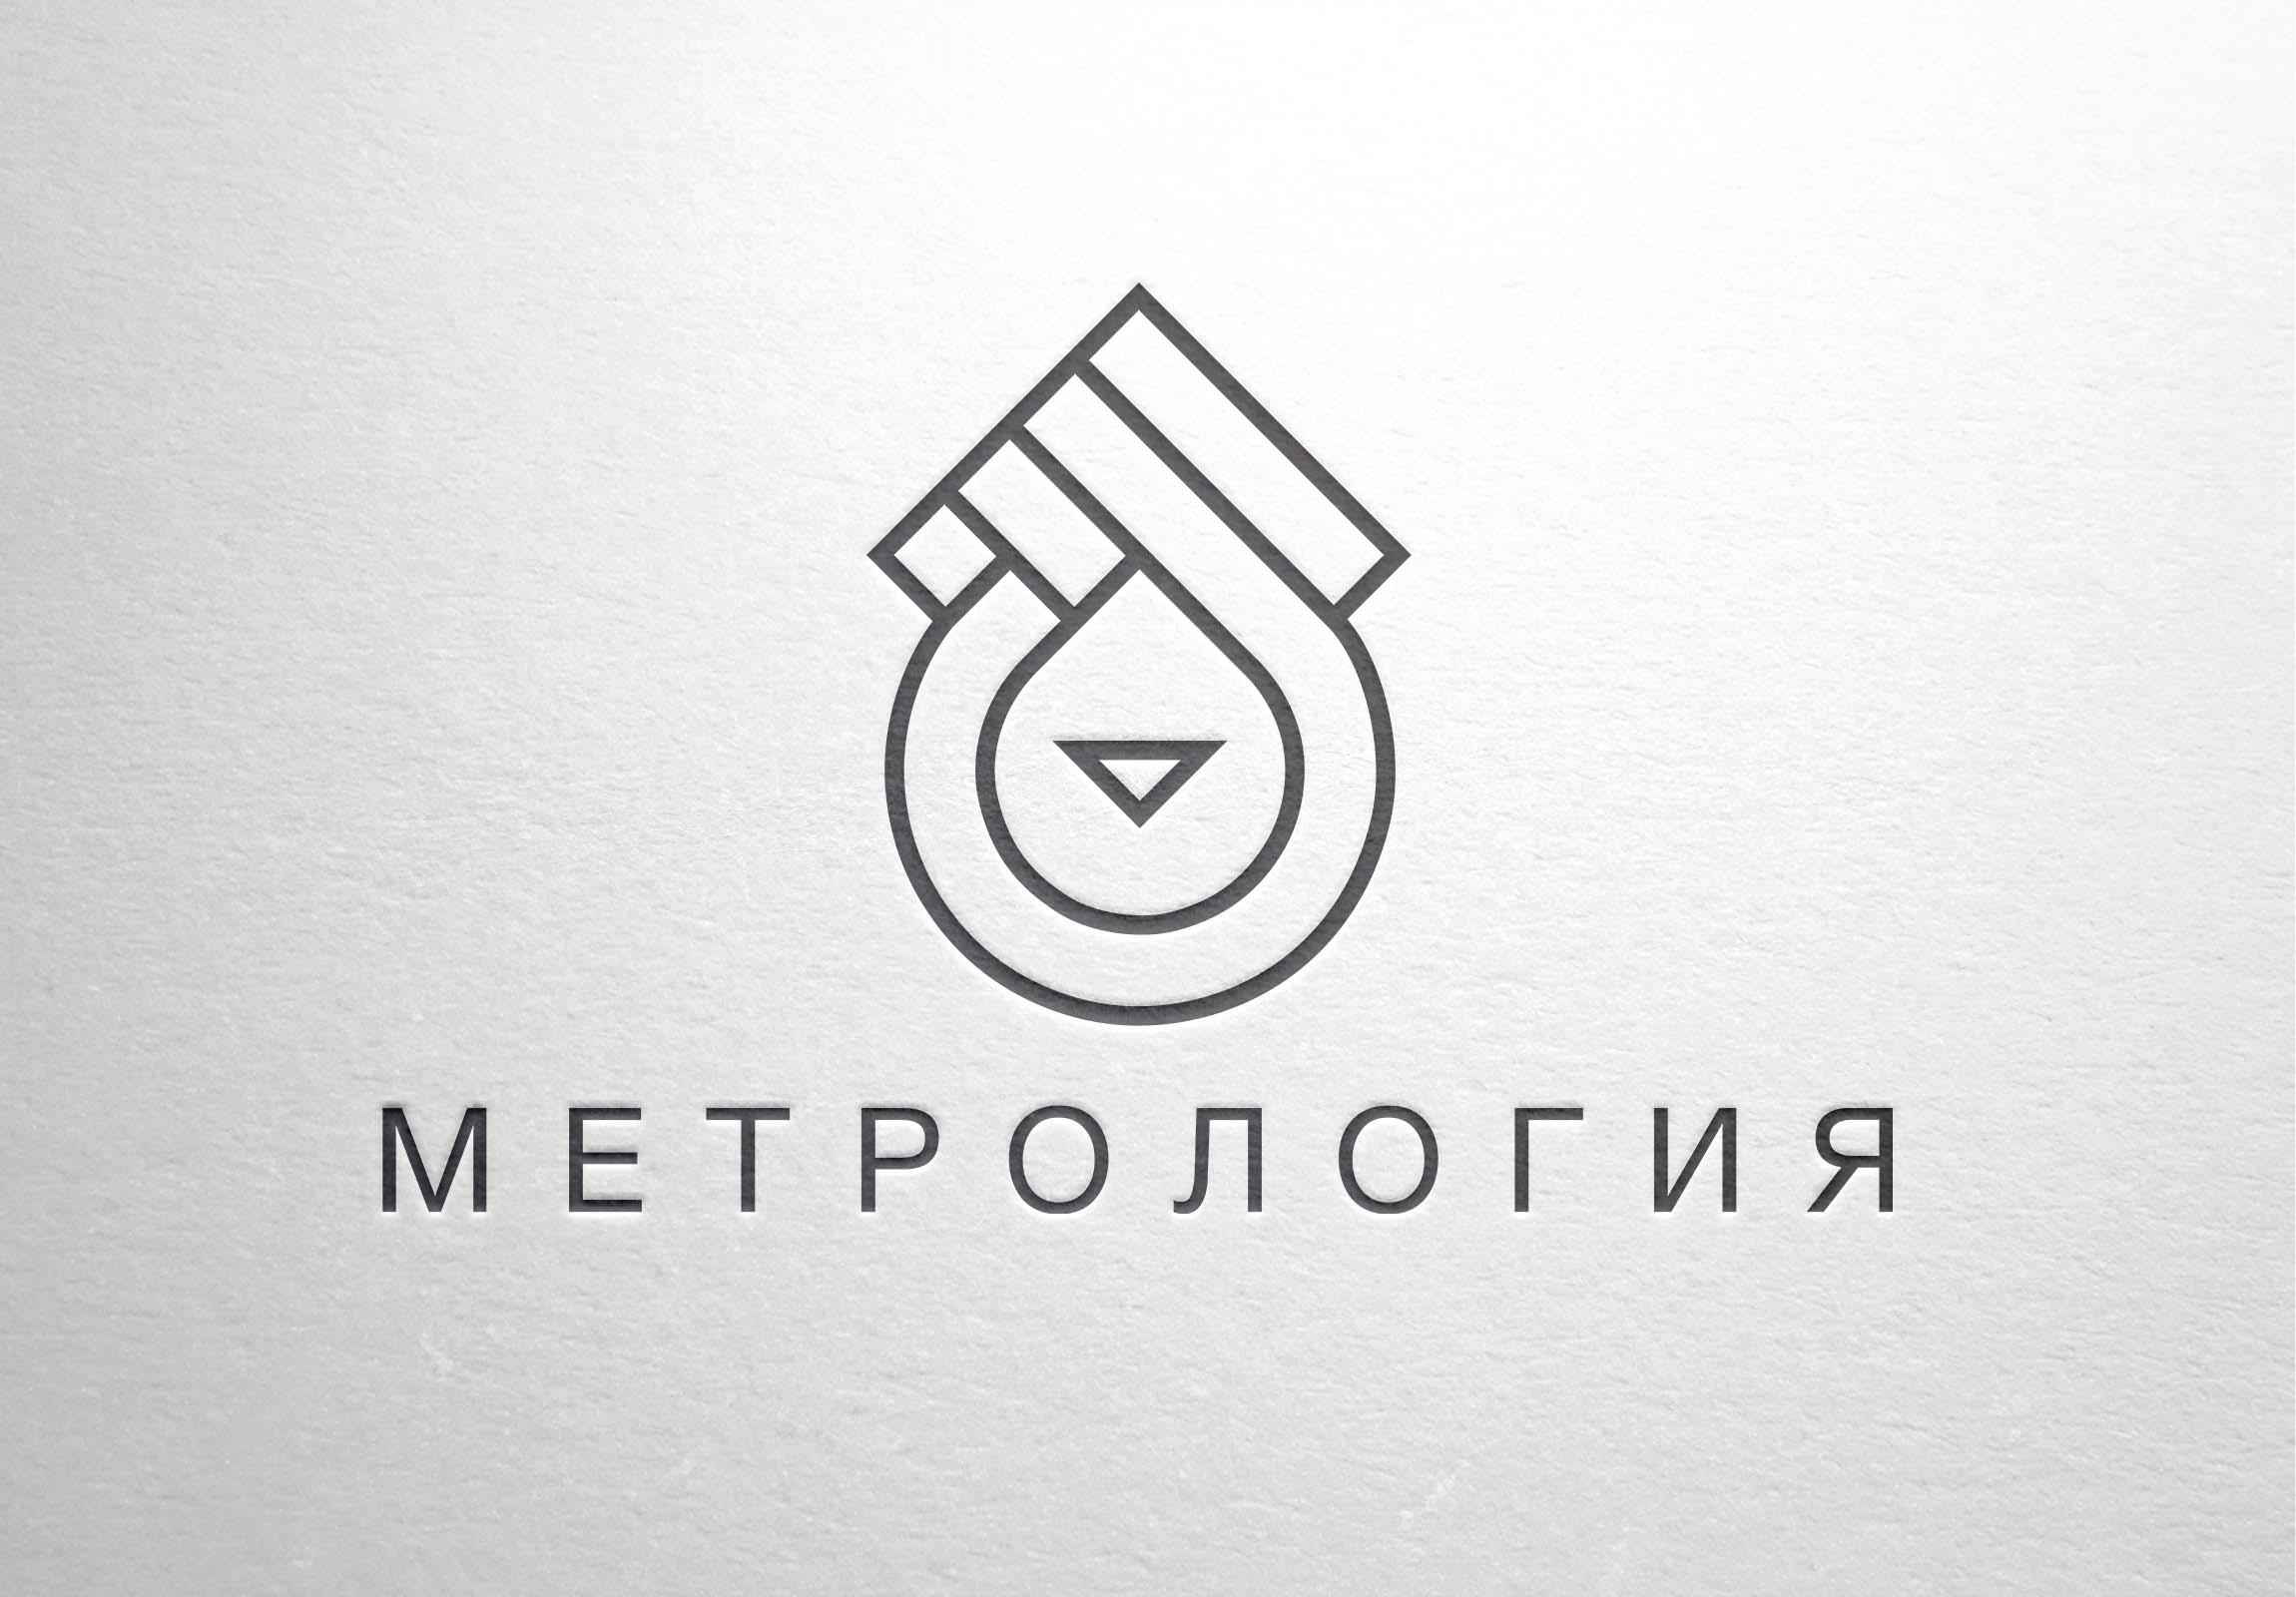 Разработать логотип, визитку, фирменный бланк. фото f_05758f8c7e7b41cc.jpg